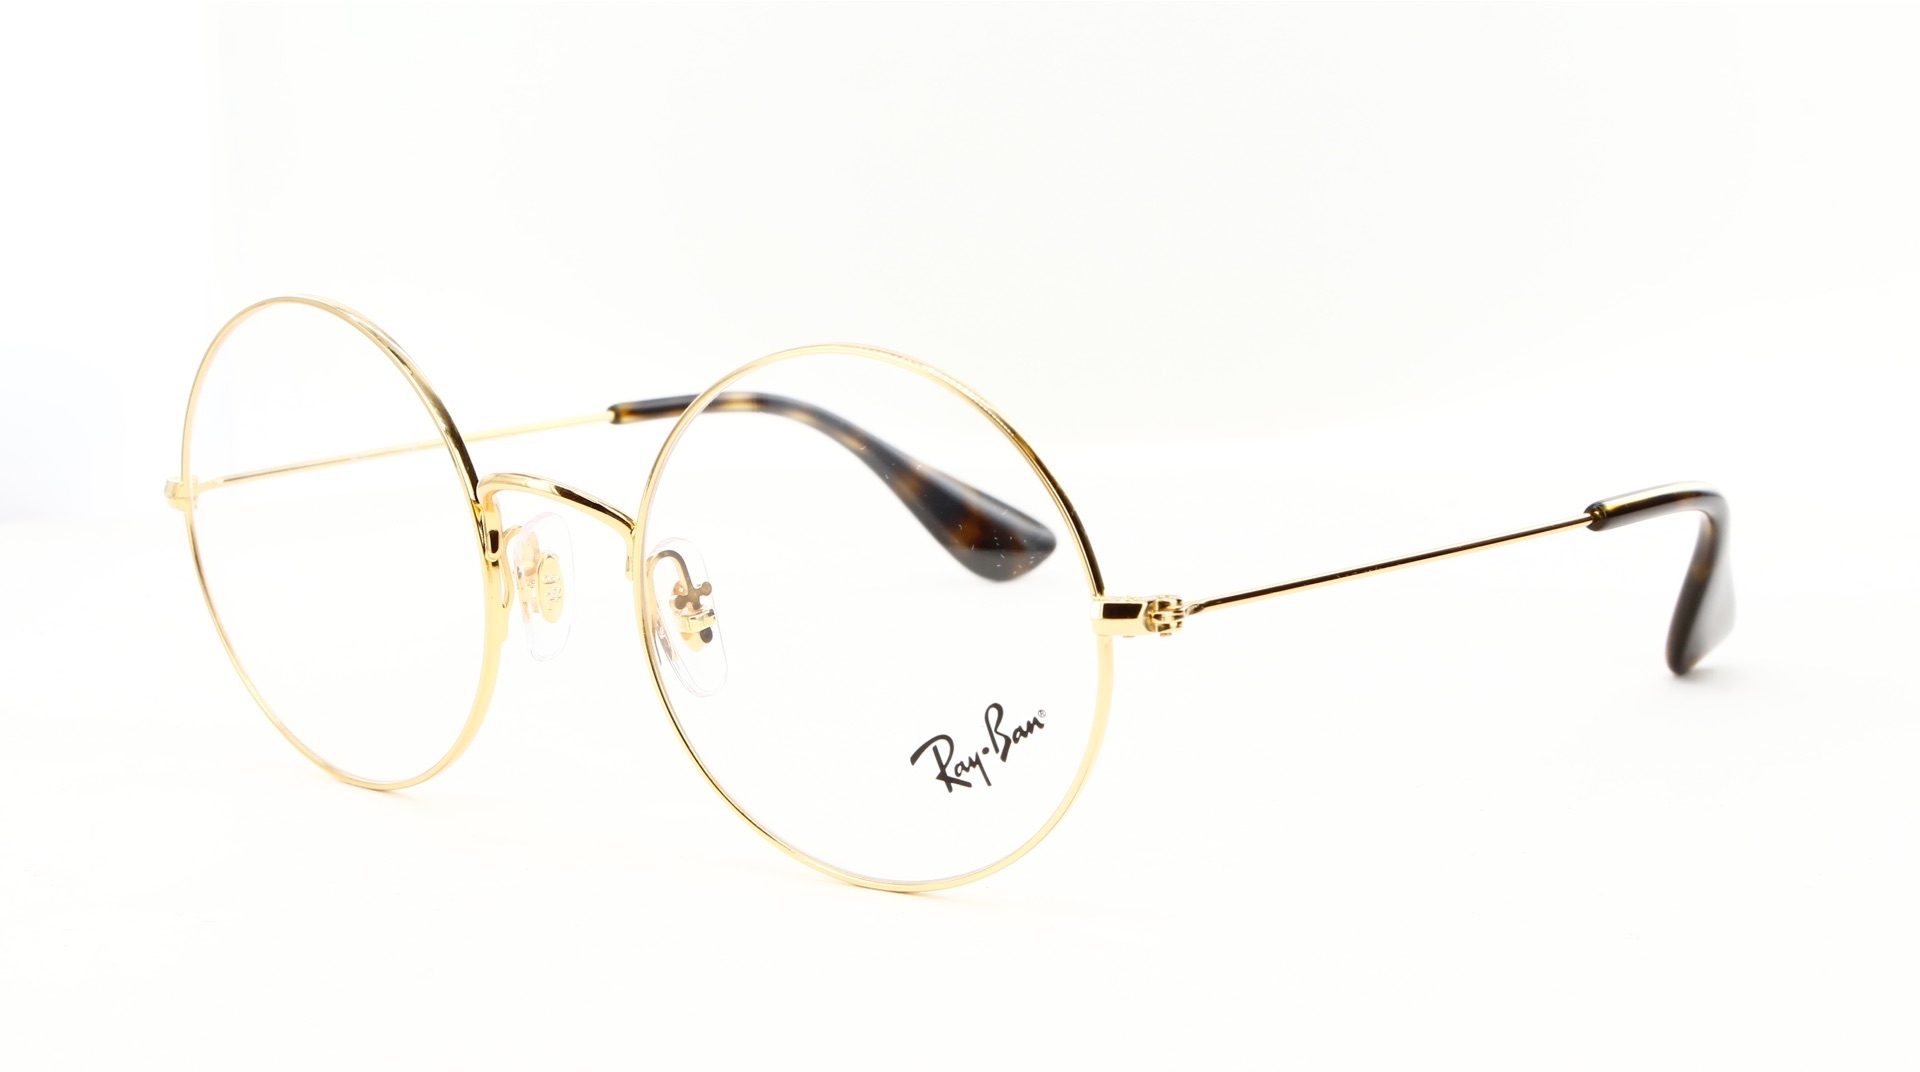 Ray-Ban - ref: 80620